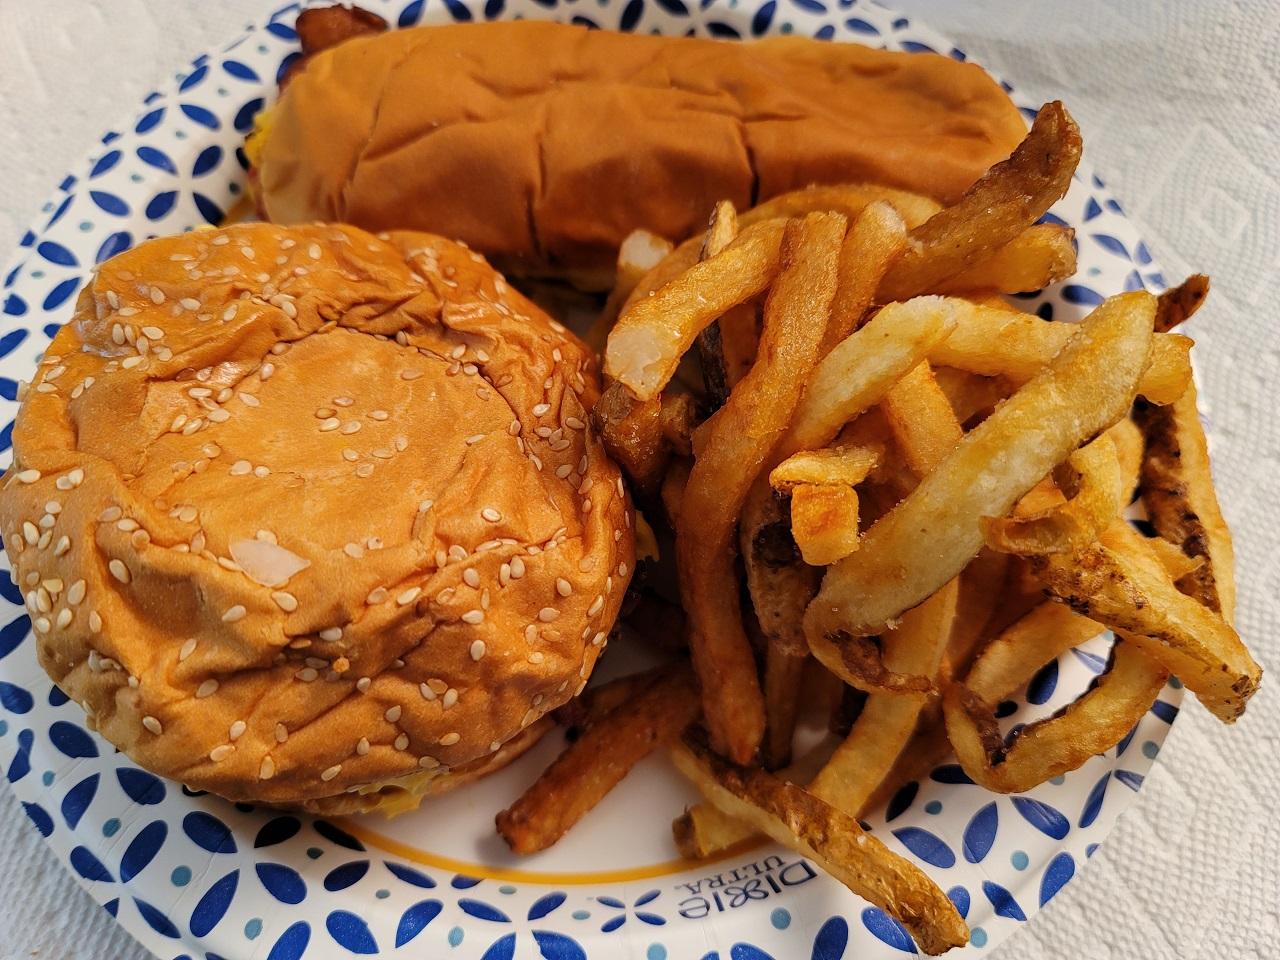 Five Guys Burger Food Hotdog